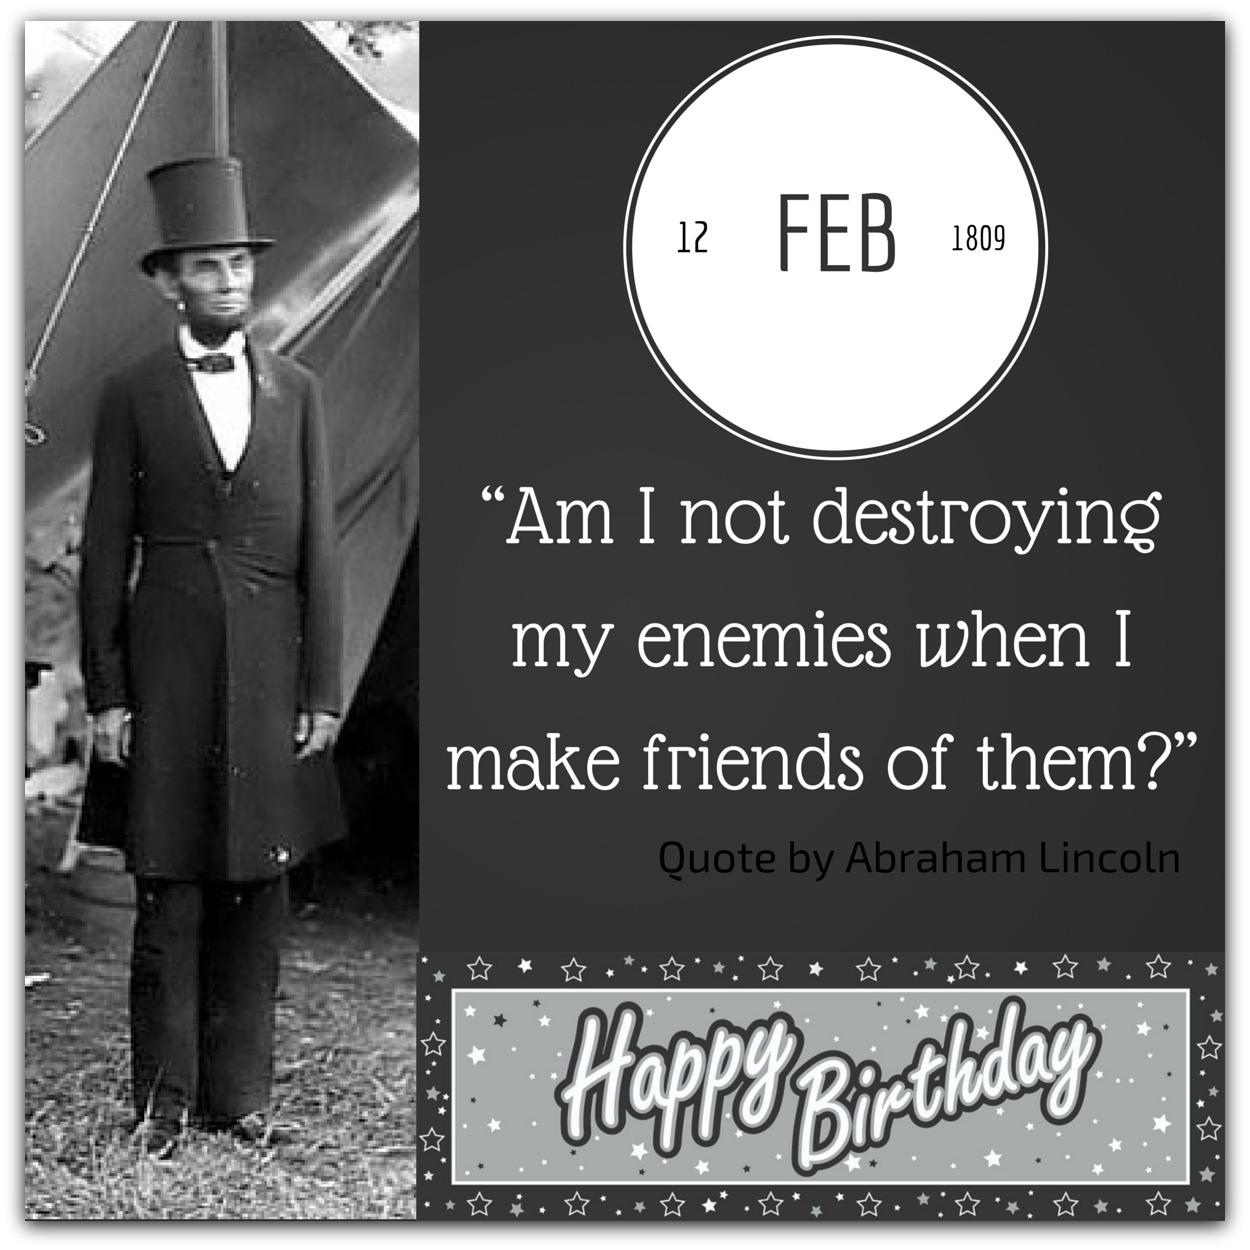 Happy Birthday Abraham Lincoln February 12 Event